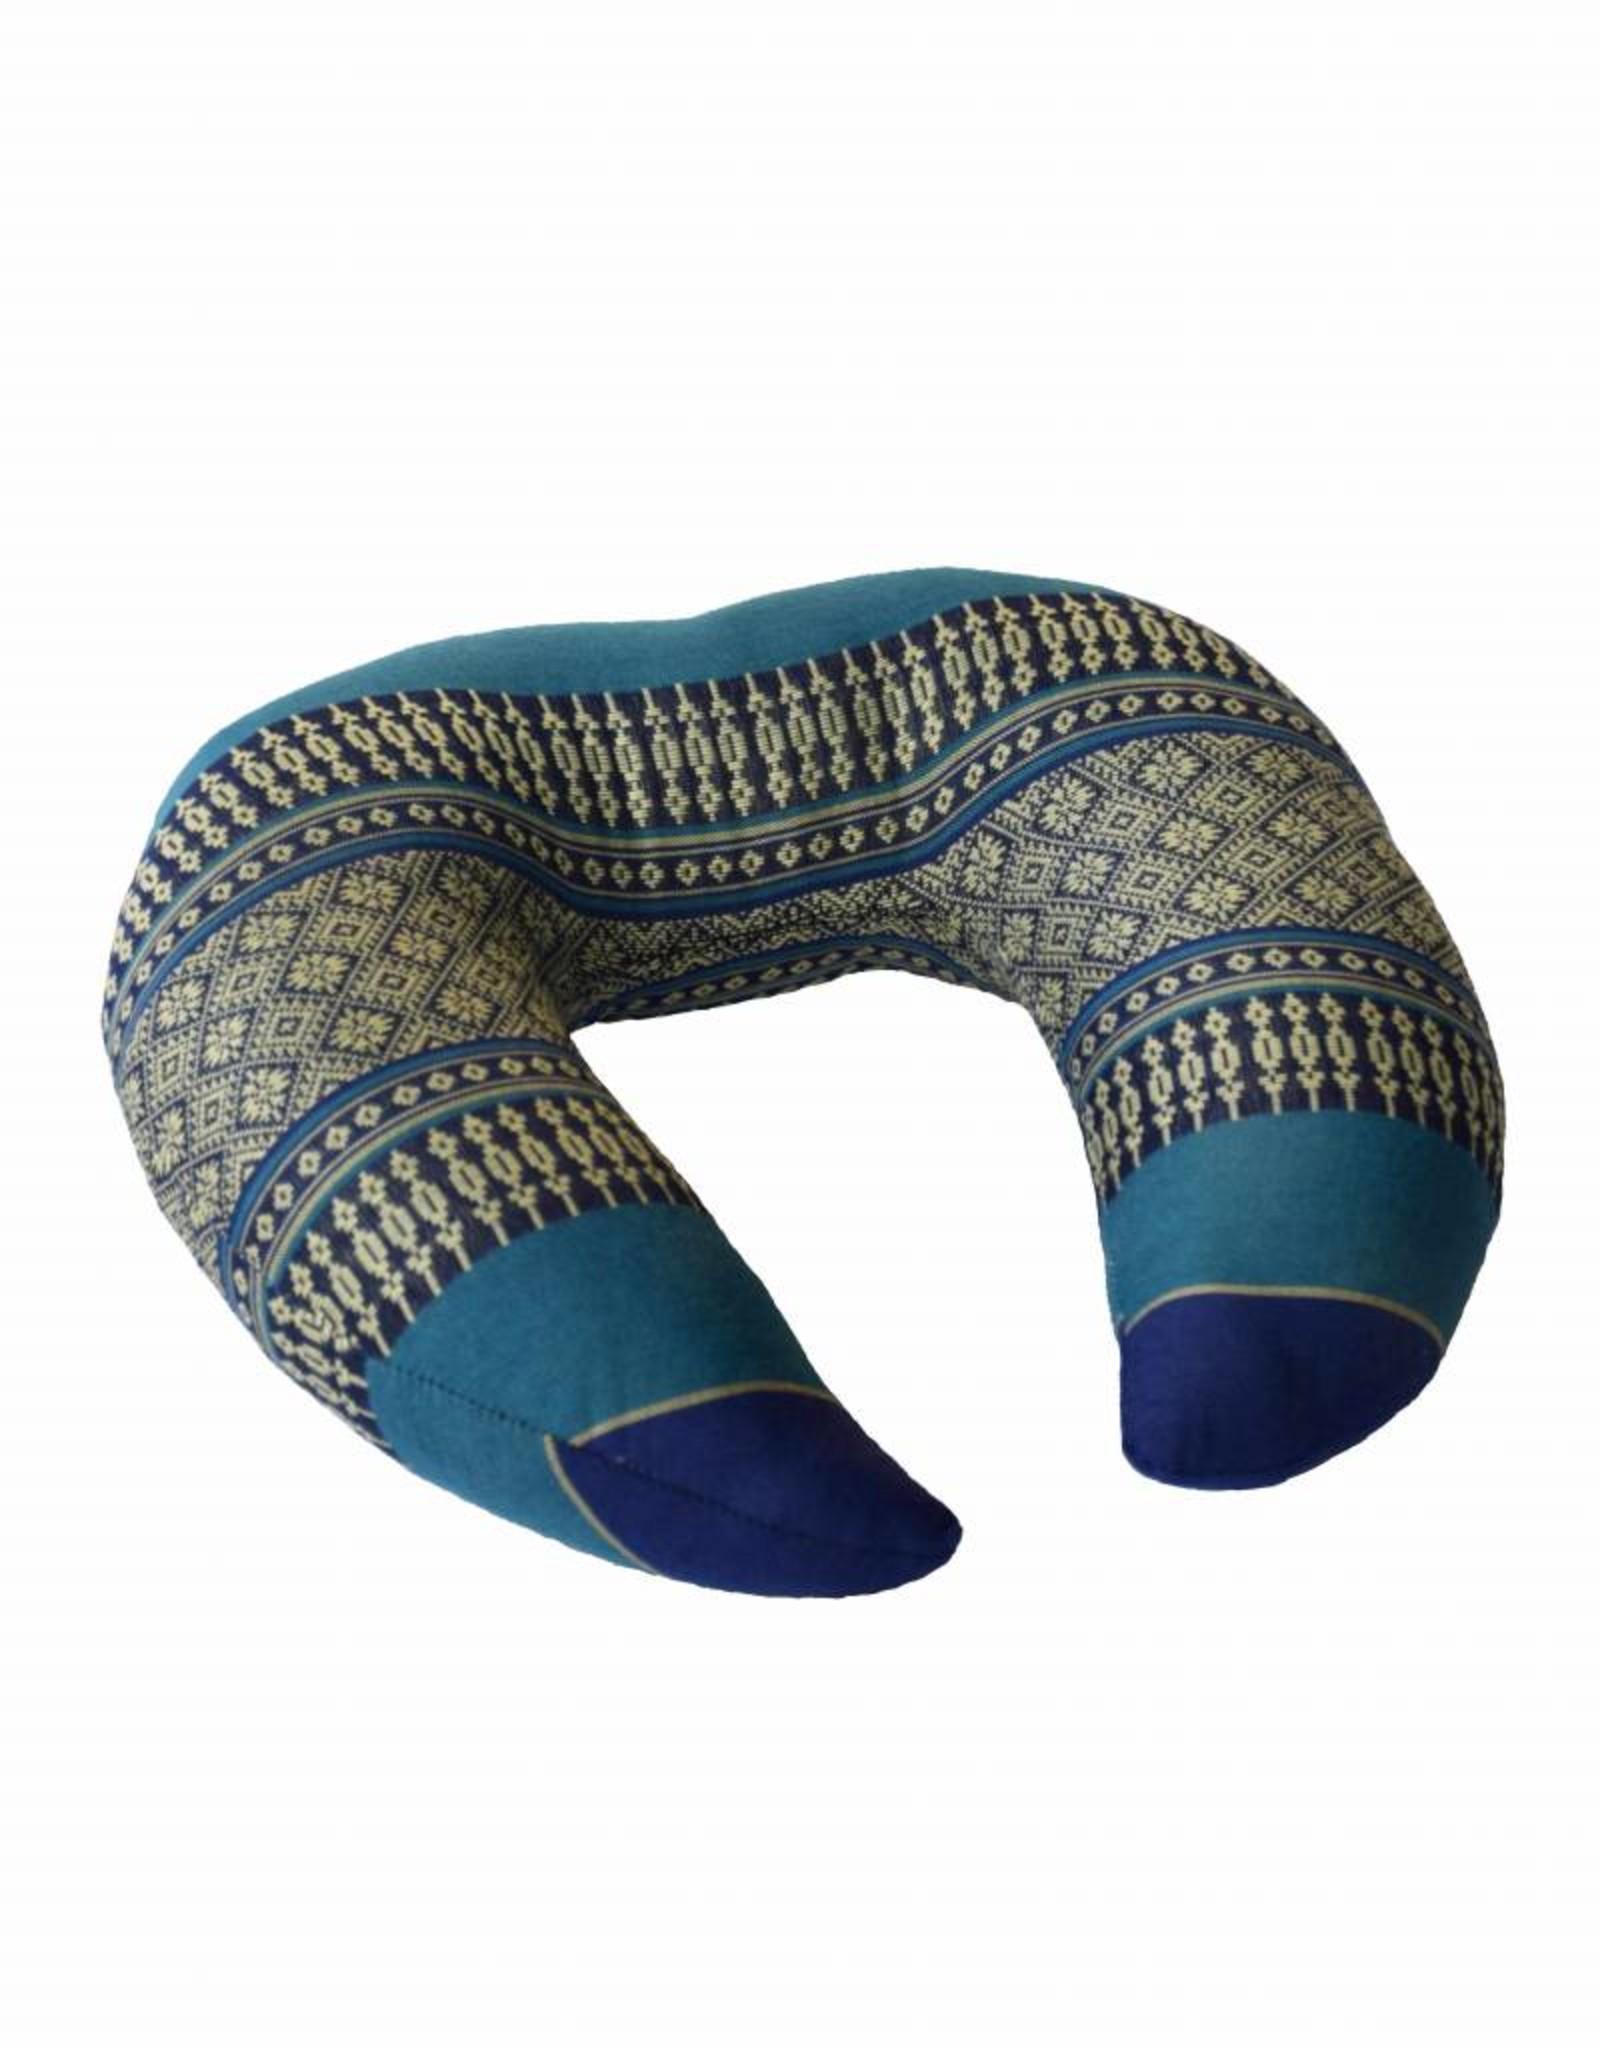 Thai Moonz Handmade Neck and Travel Pillow Fly Dark Blue/Blue